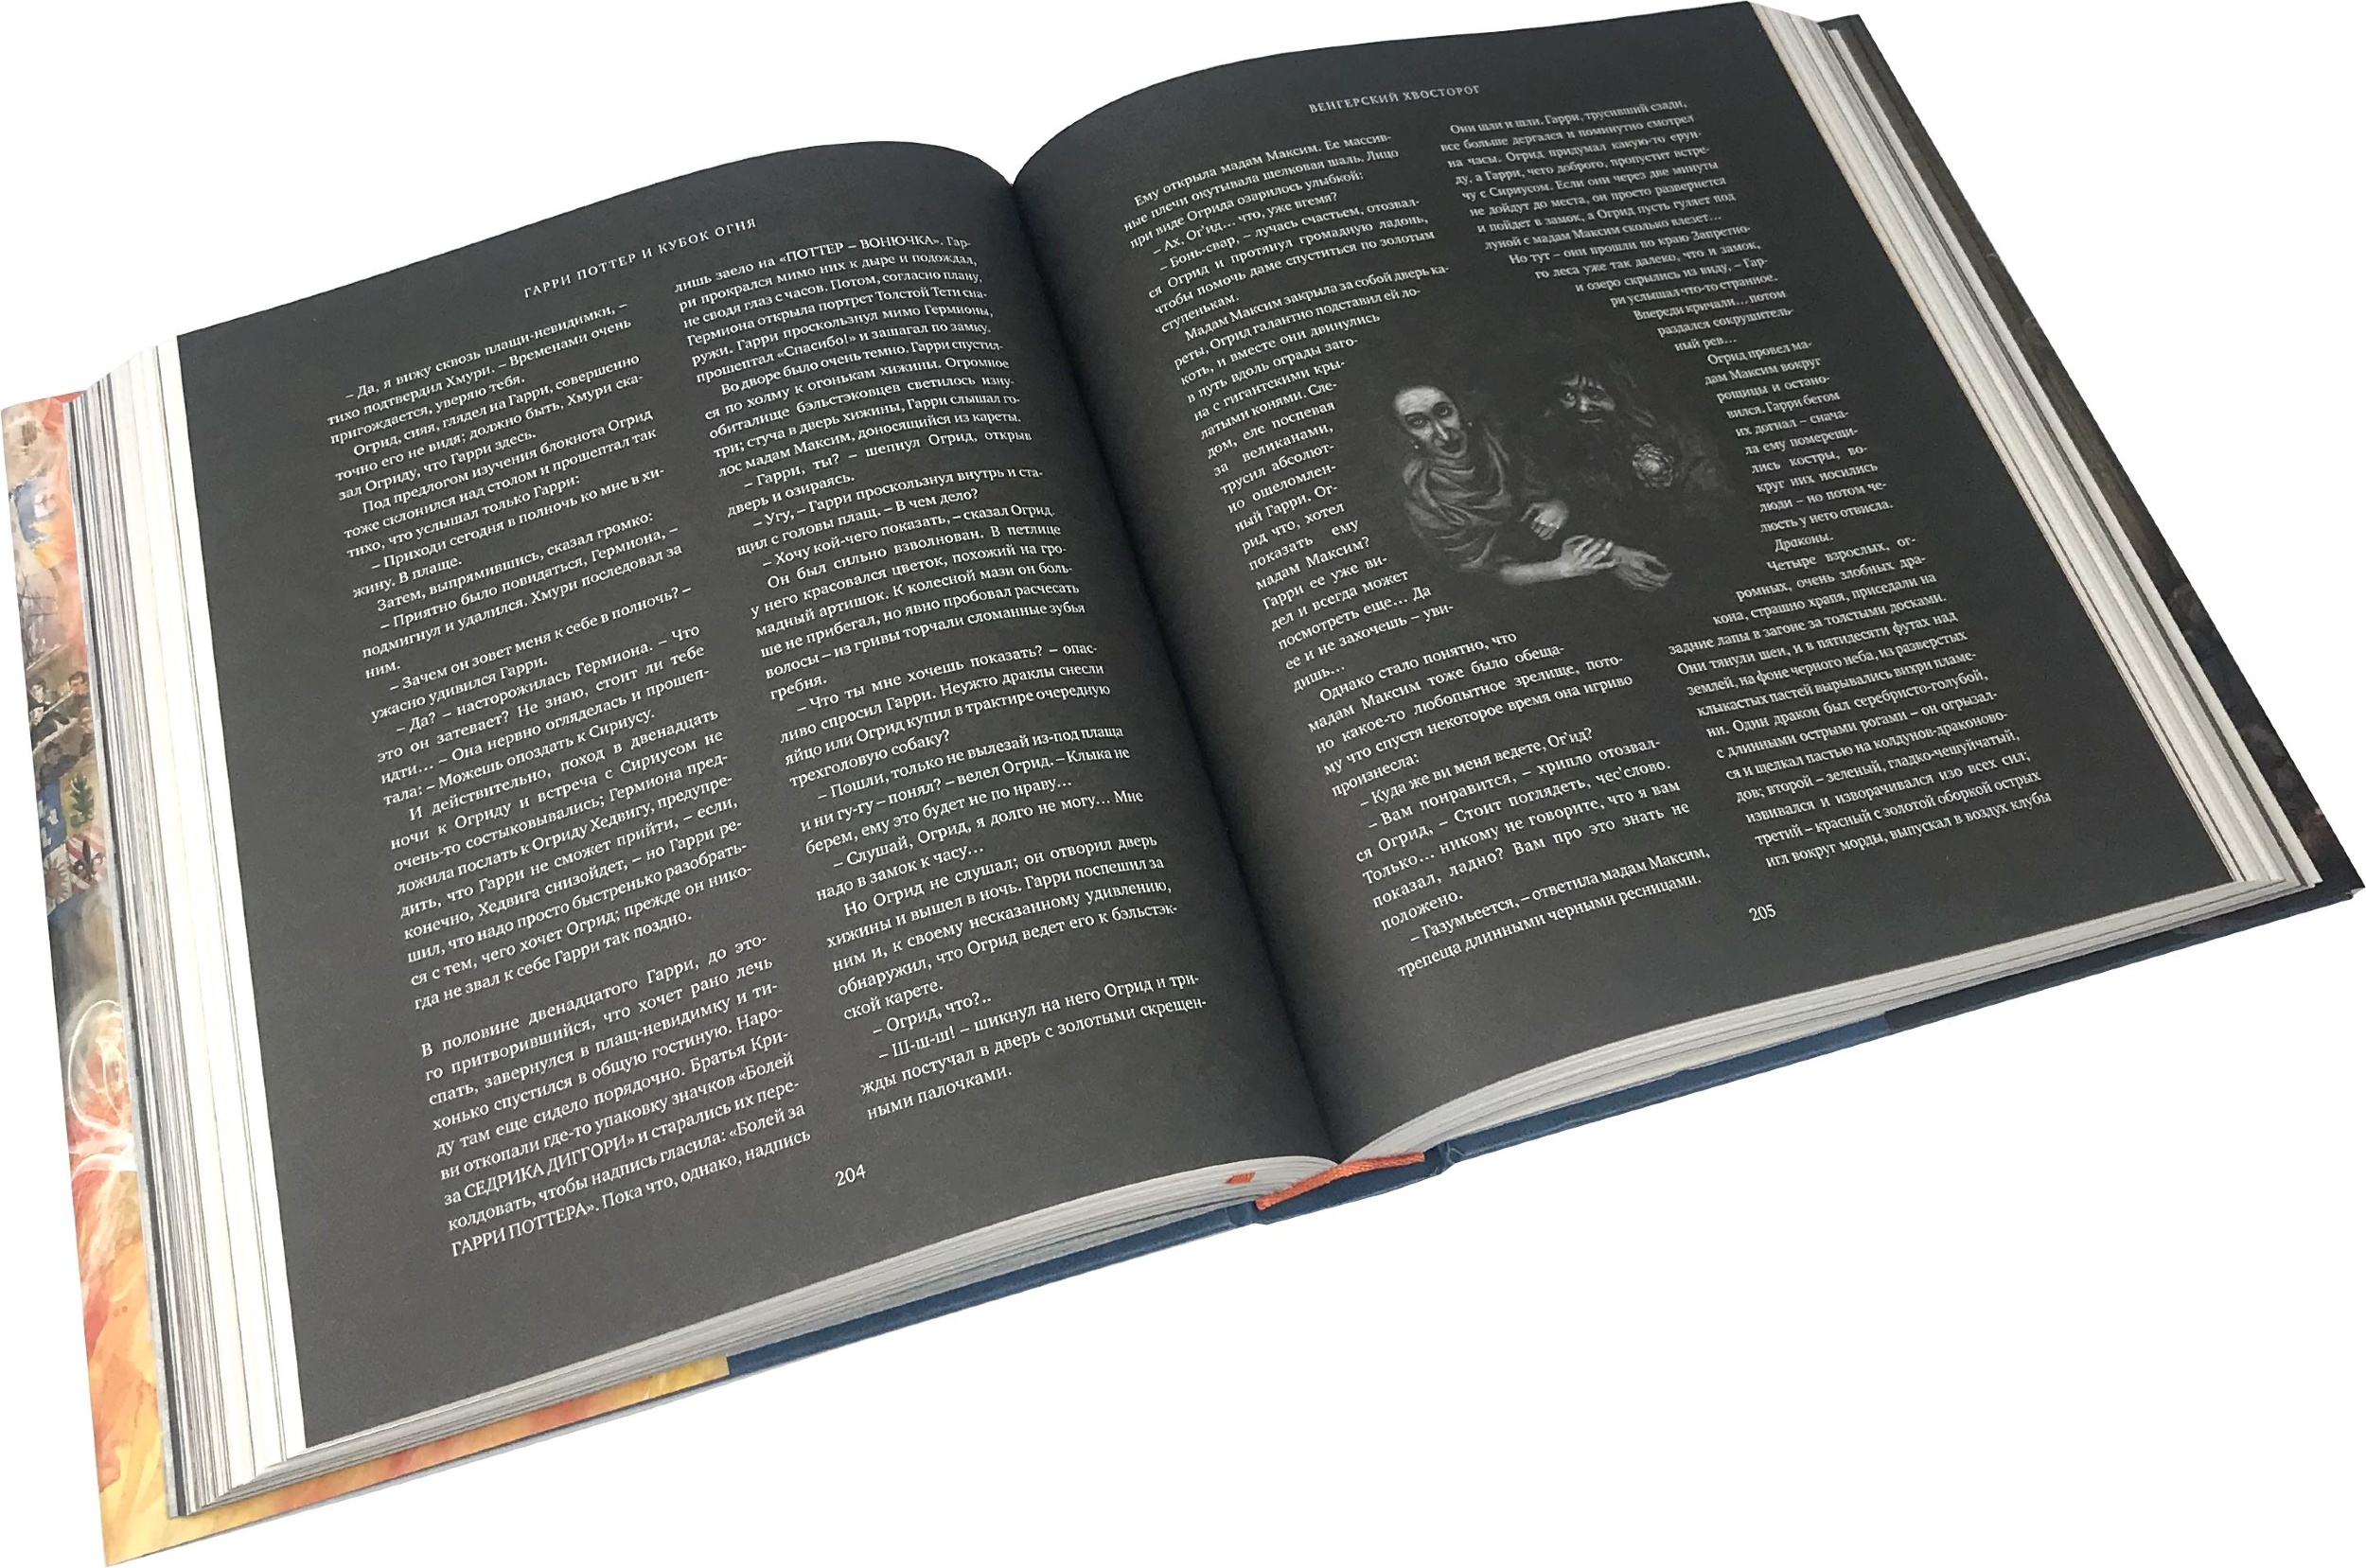 Гарри Поттер и Кубок Огня. Автор — Джоан Роулинг. Переплет —